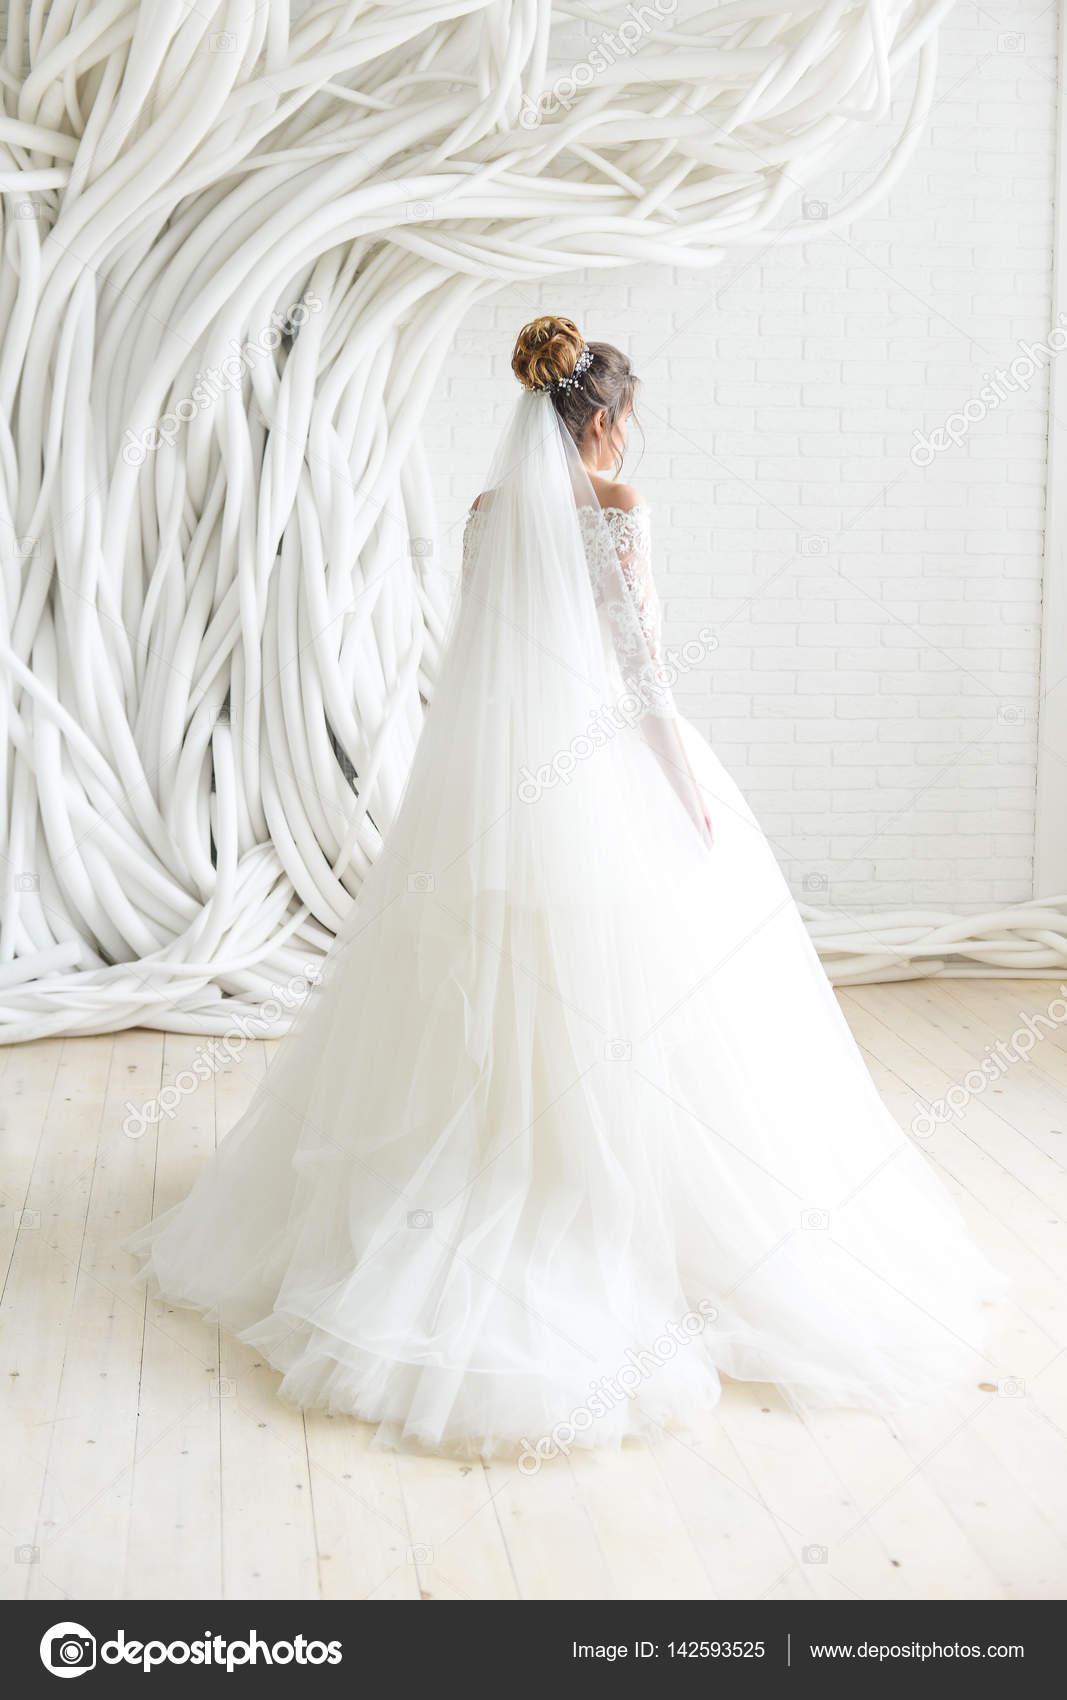 Vestido de novia en la sala blanca — Foto de stock © Alex.S. #142593525